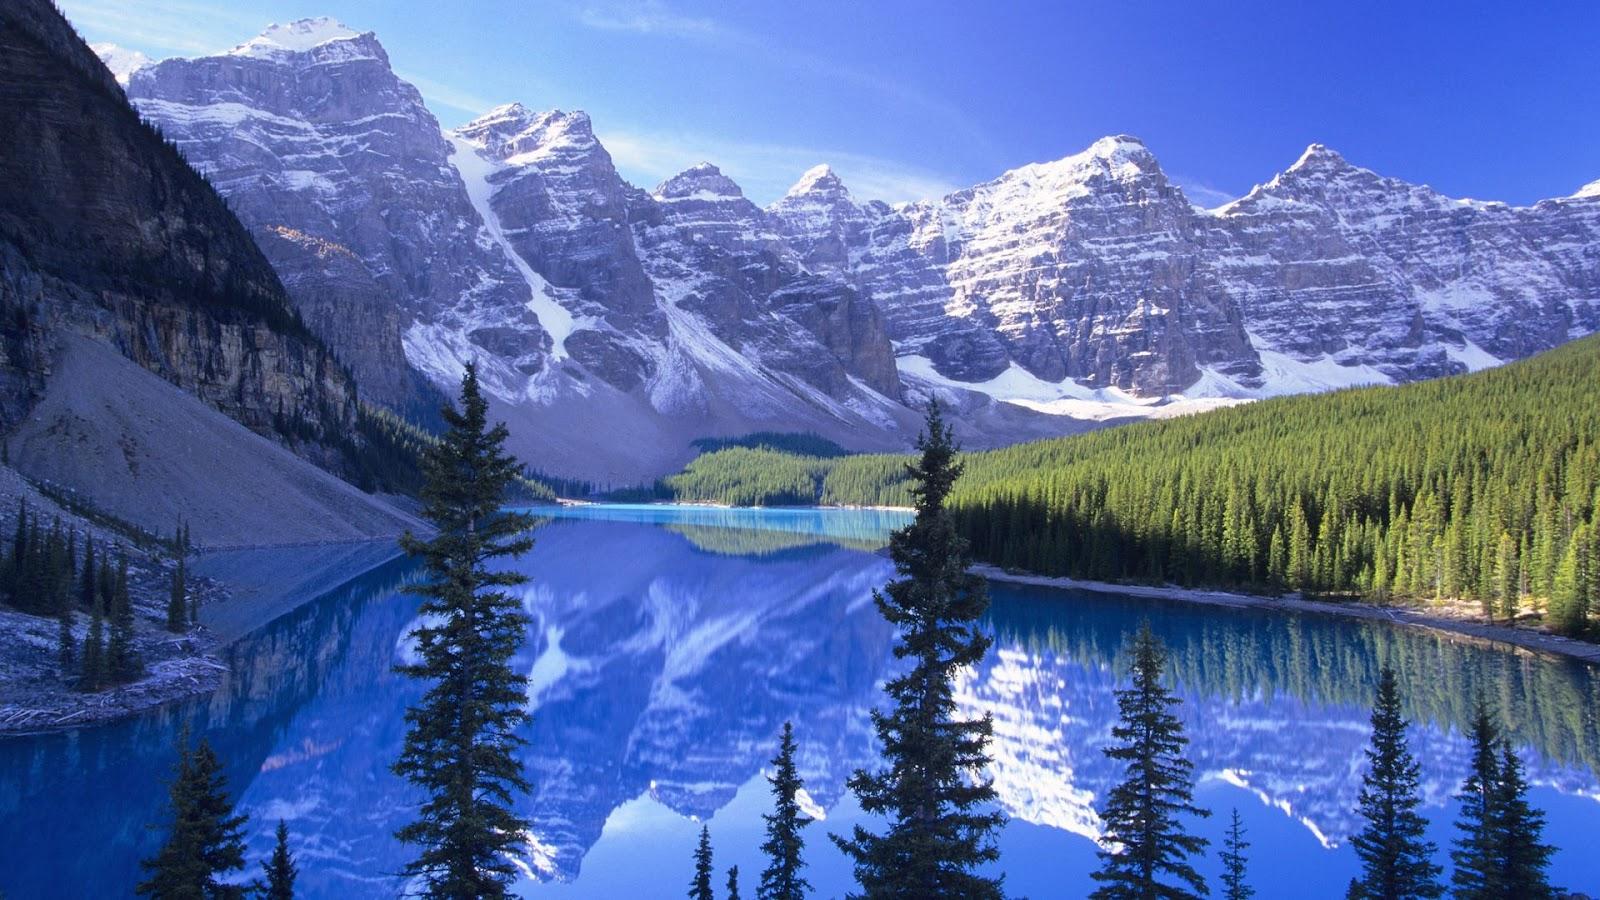 Mountain Wallpaper Mountain Full High Definition Quality 1600x900